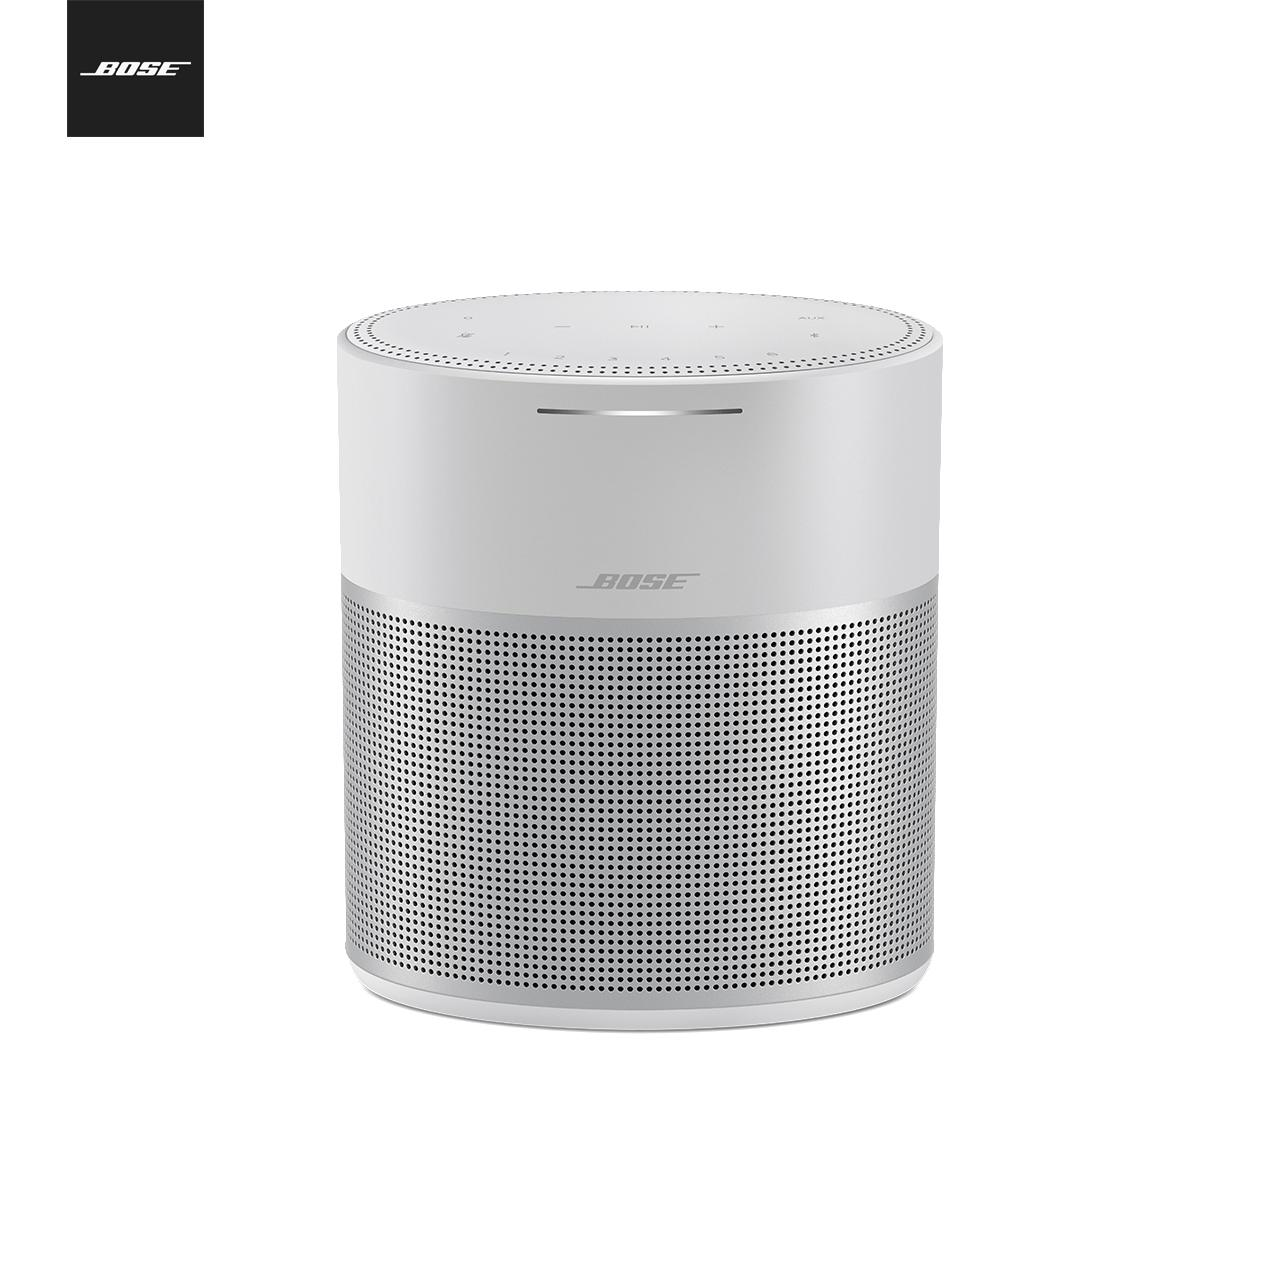 Loa Bose Home Speaker 300 Đang Giảm Giá